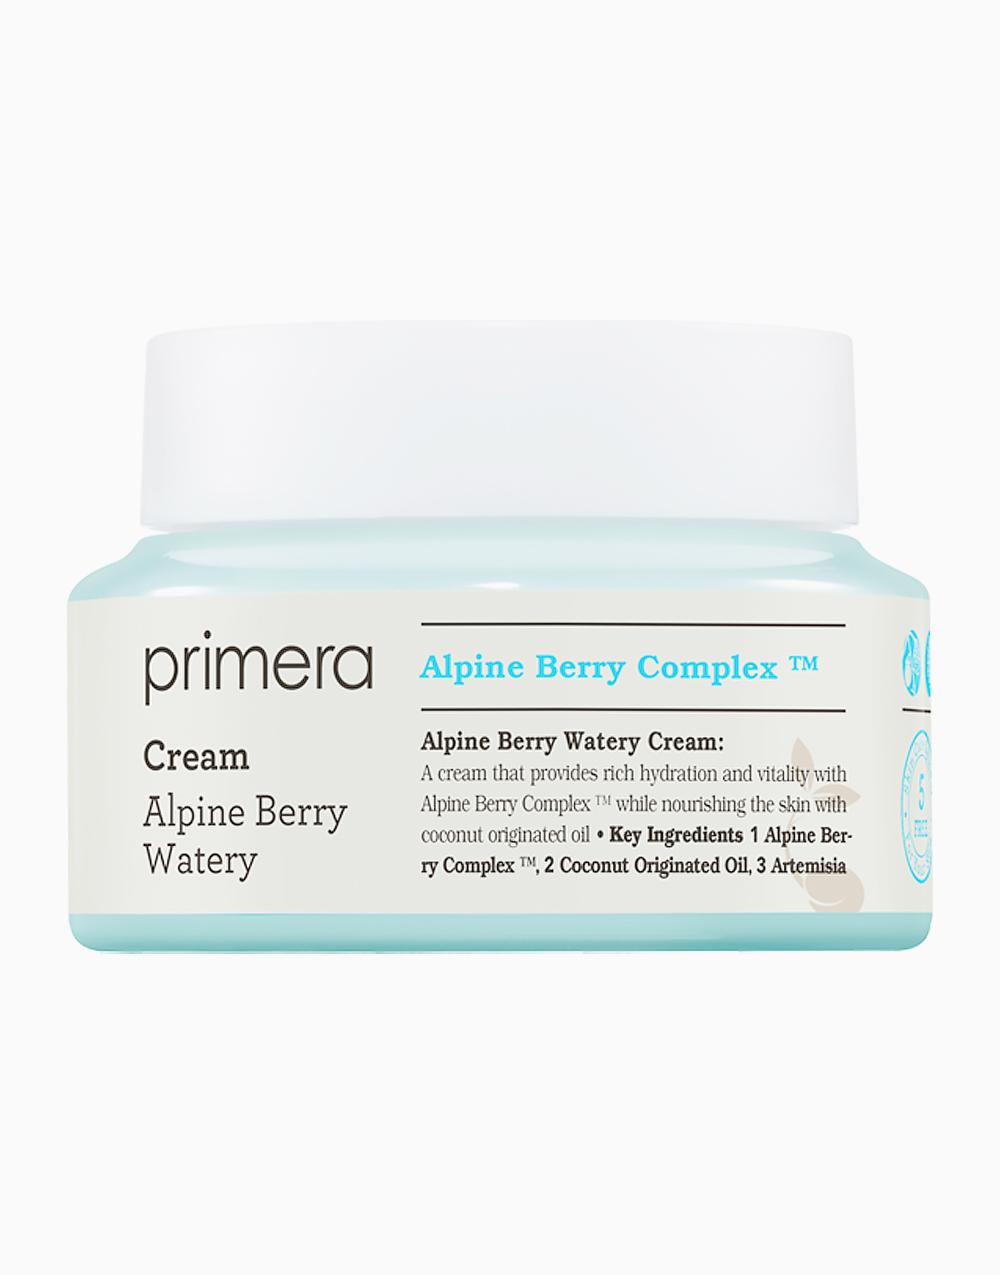 Alpine Berry Watery Cream by Primera